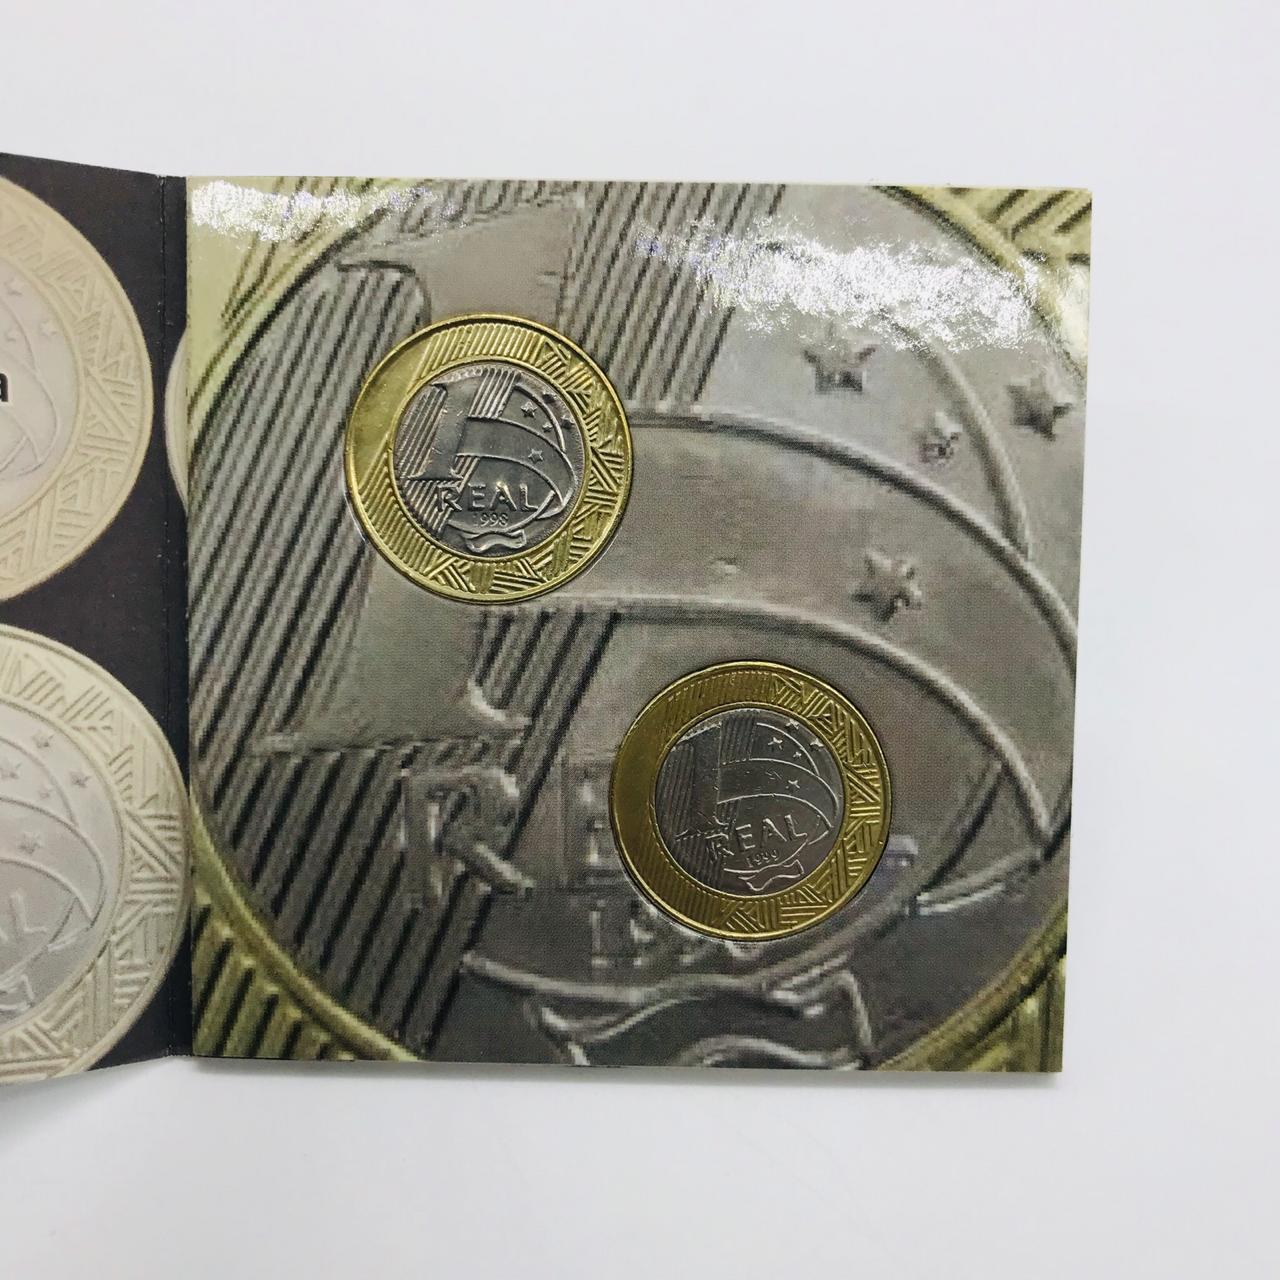 Casal de moedas de 1 Real - baixa tiragem (1998-1999) MBC na Cartela